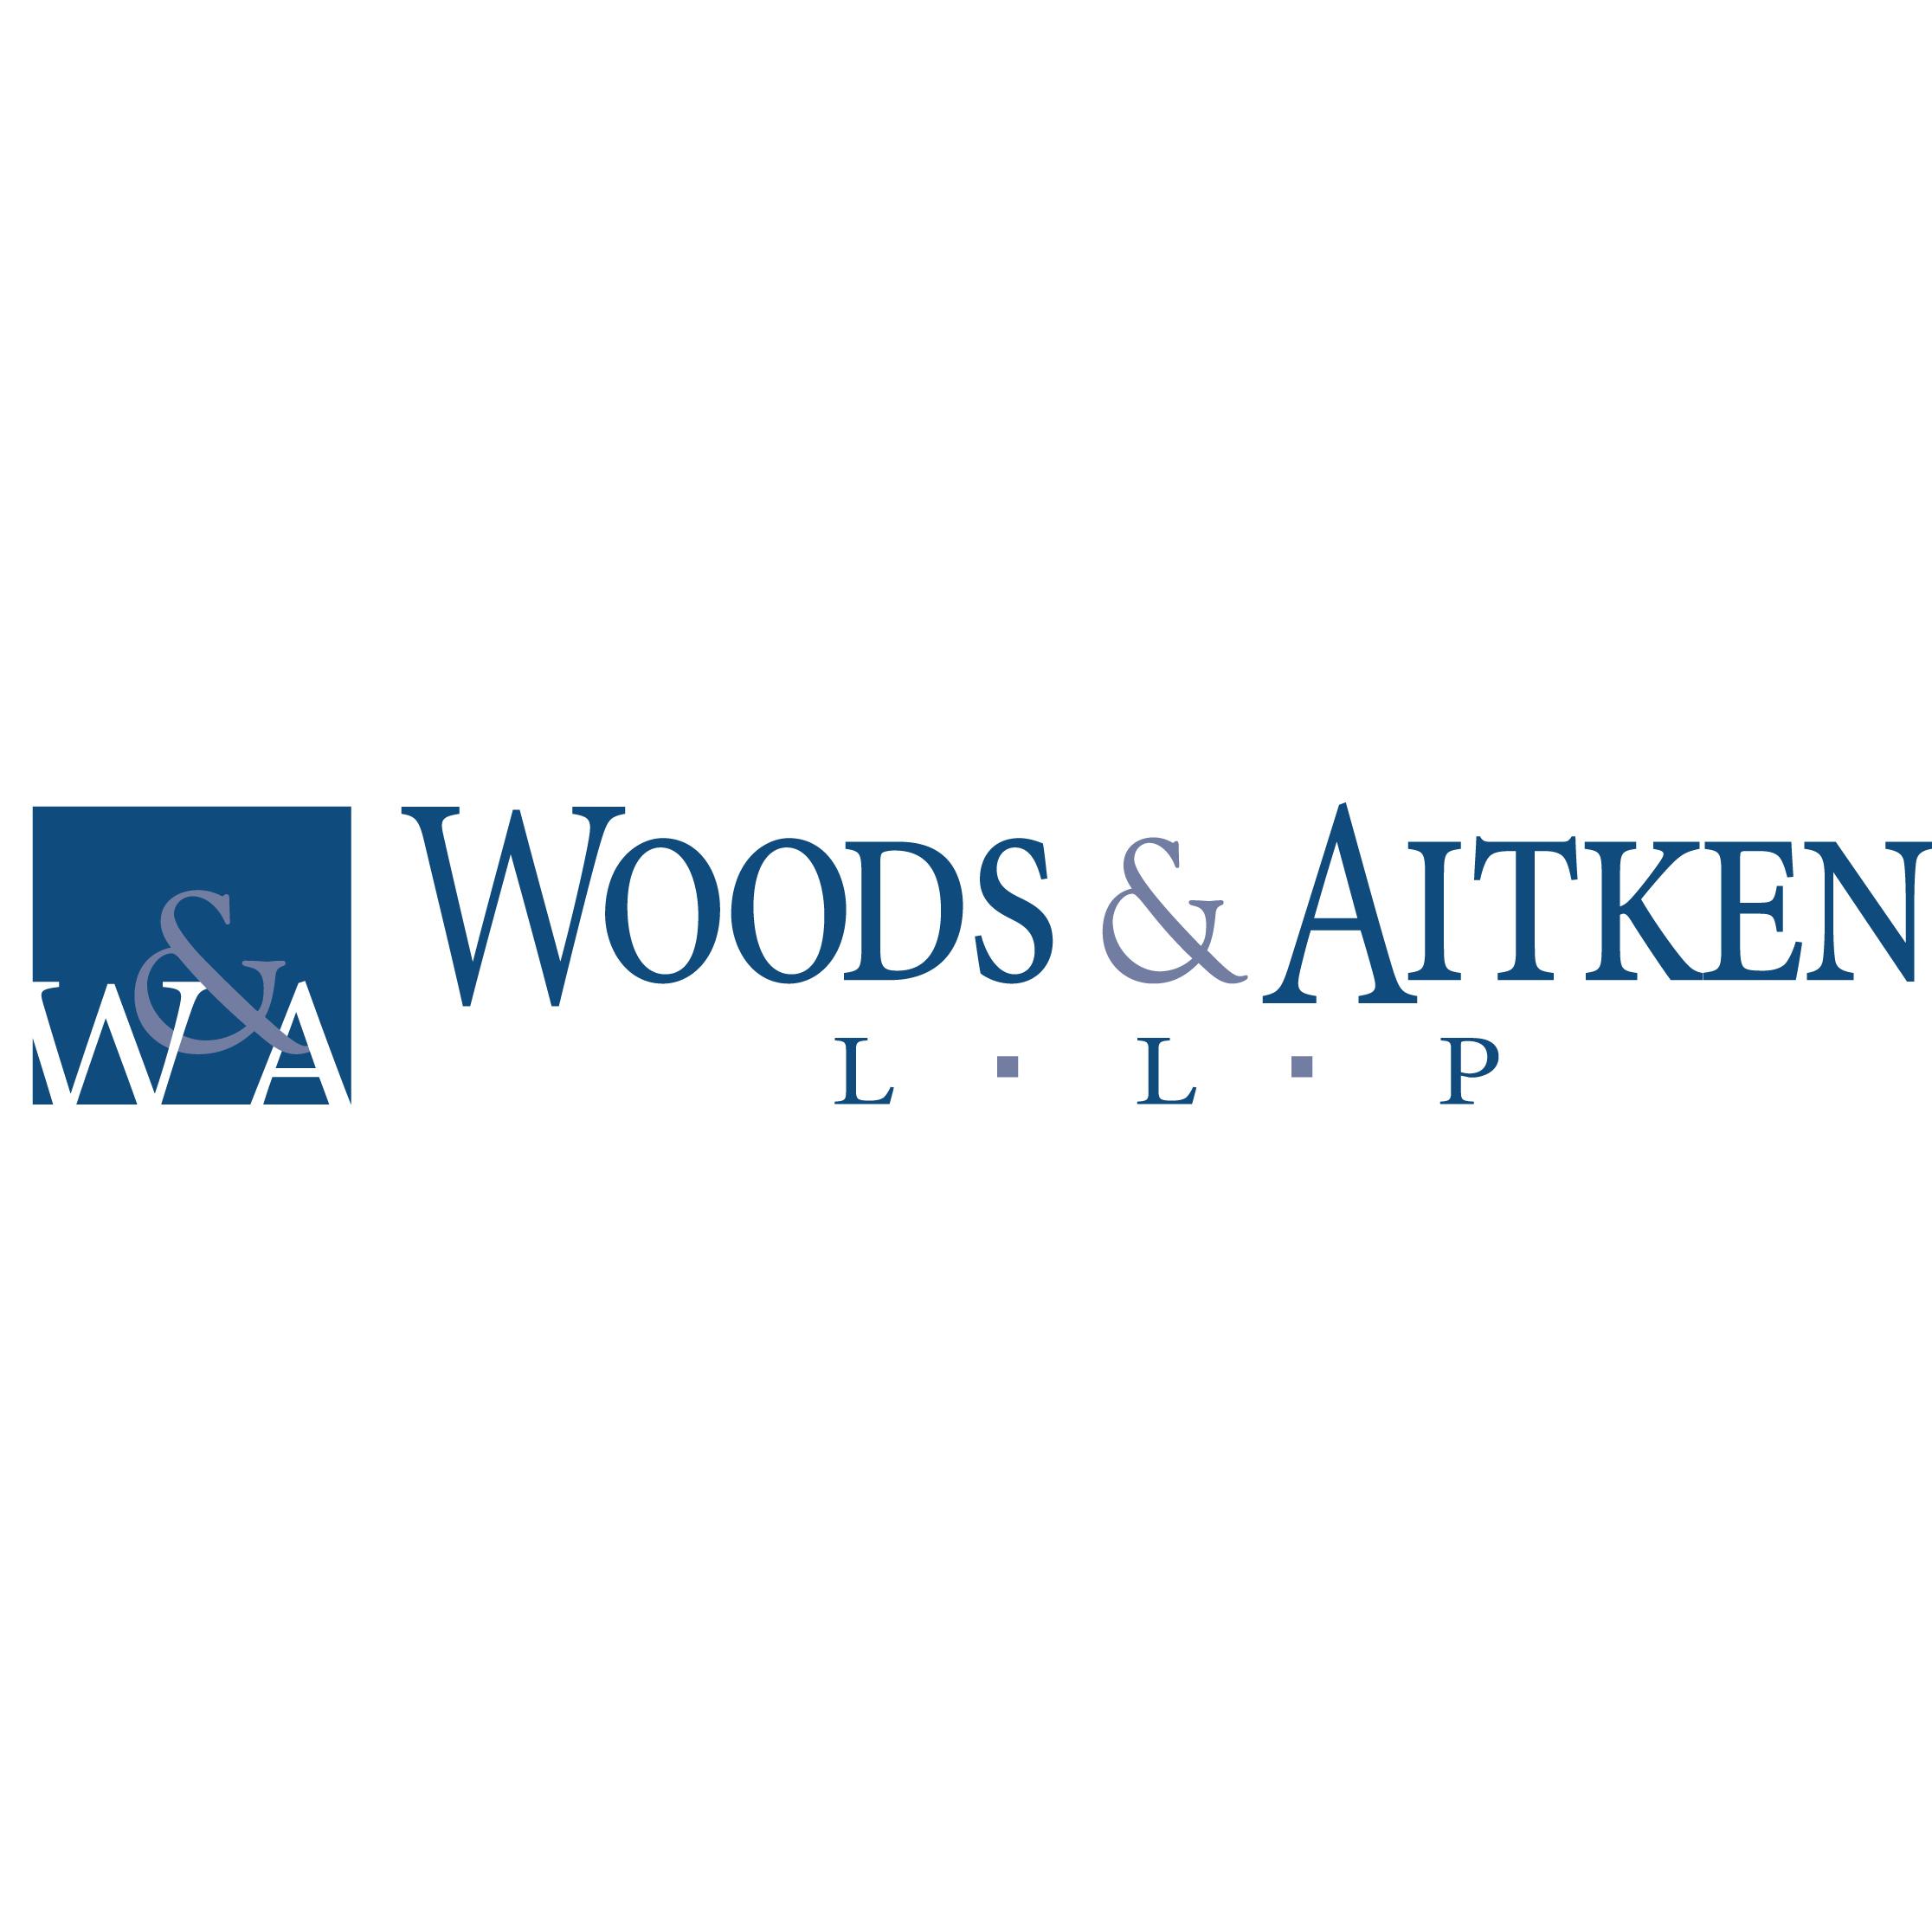 Woods & Aitken Logo